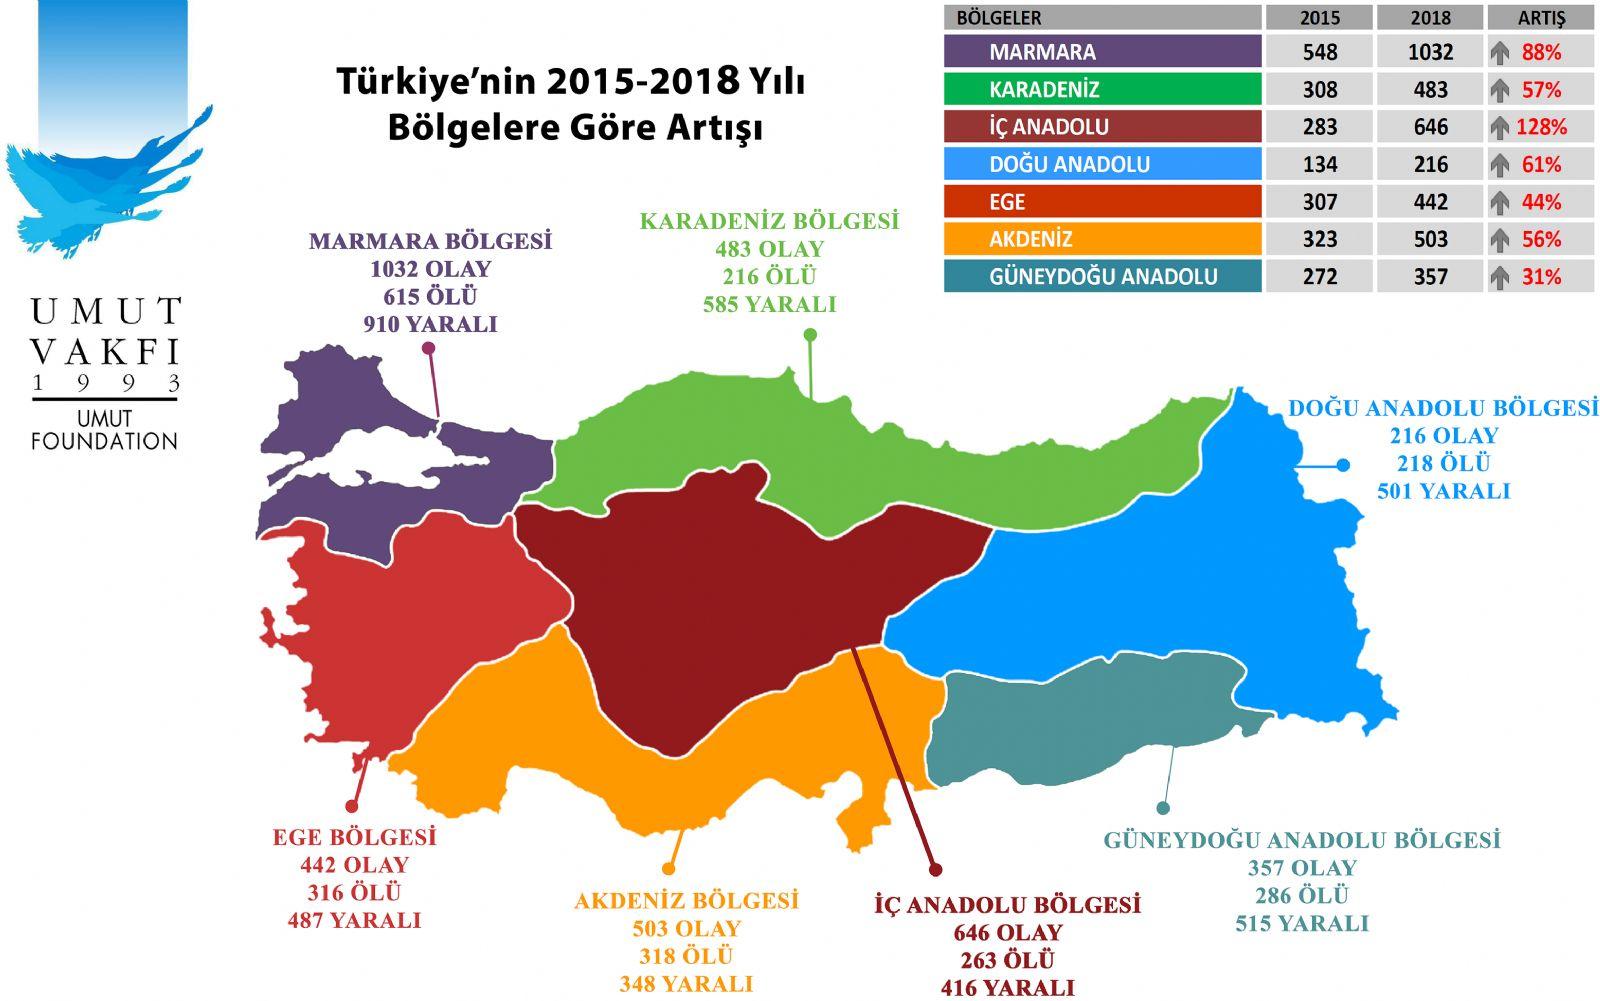 umut vakfi turkiye silahli siddet haritasi 2018